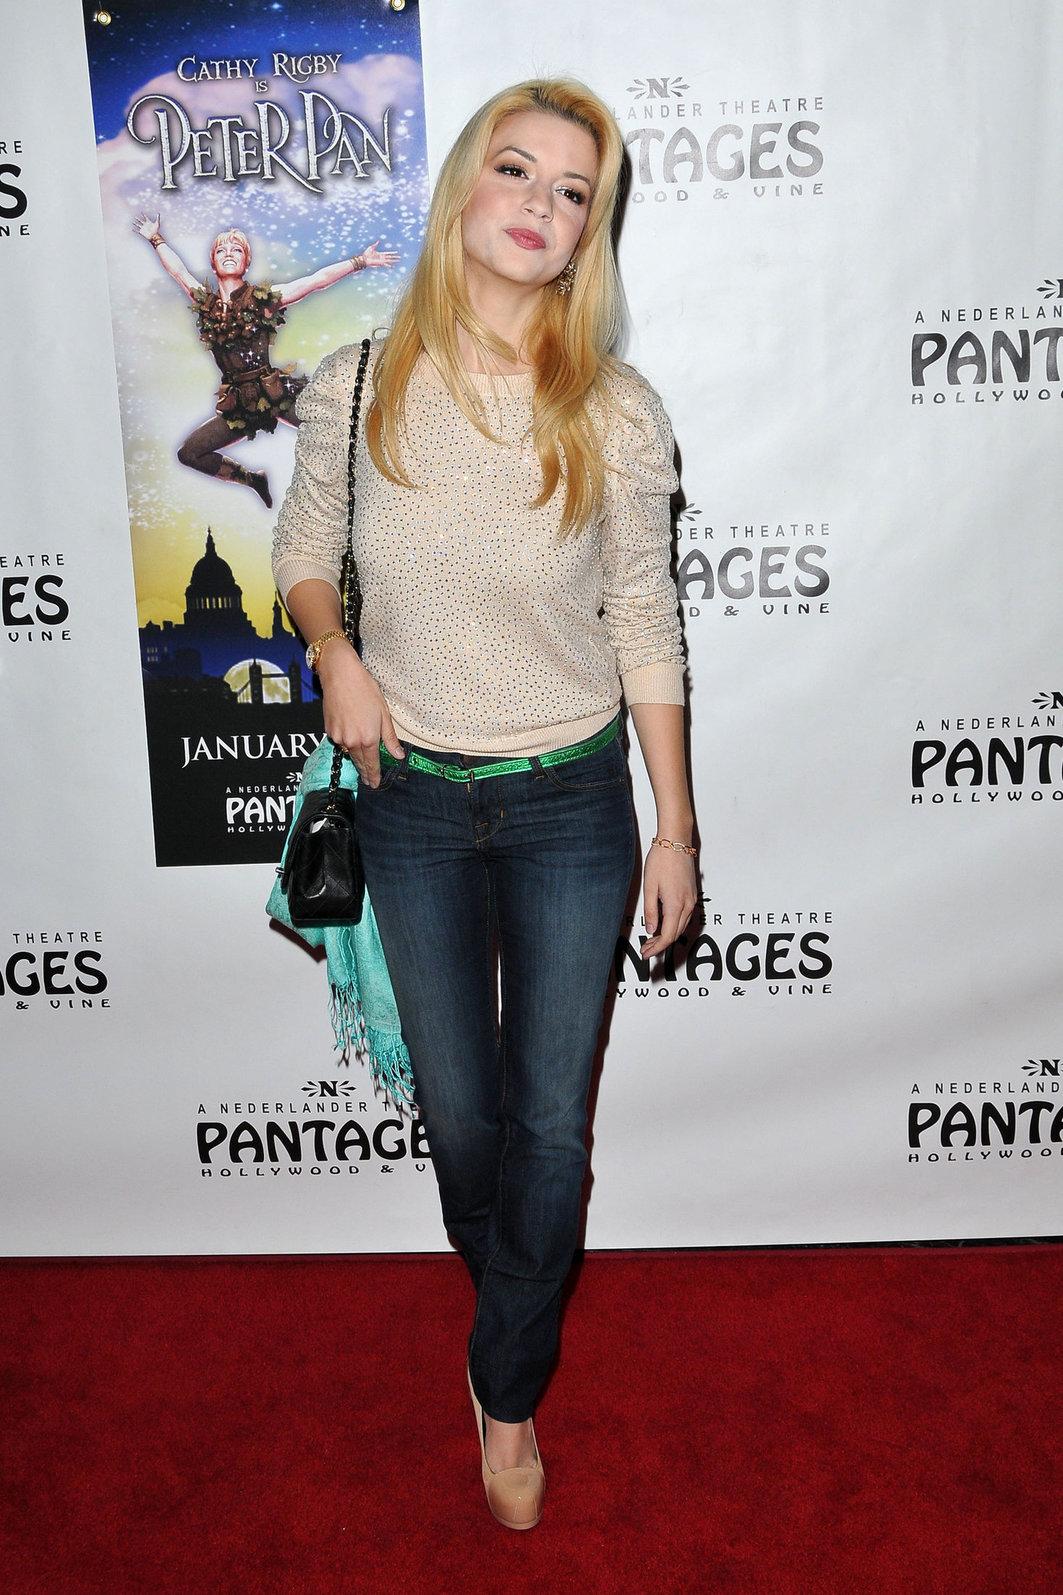 Masiela Lusha  Peter Pan  Opening Night in Hollywood on January 15, 2013